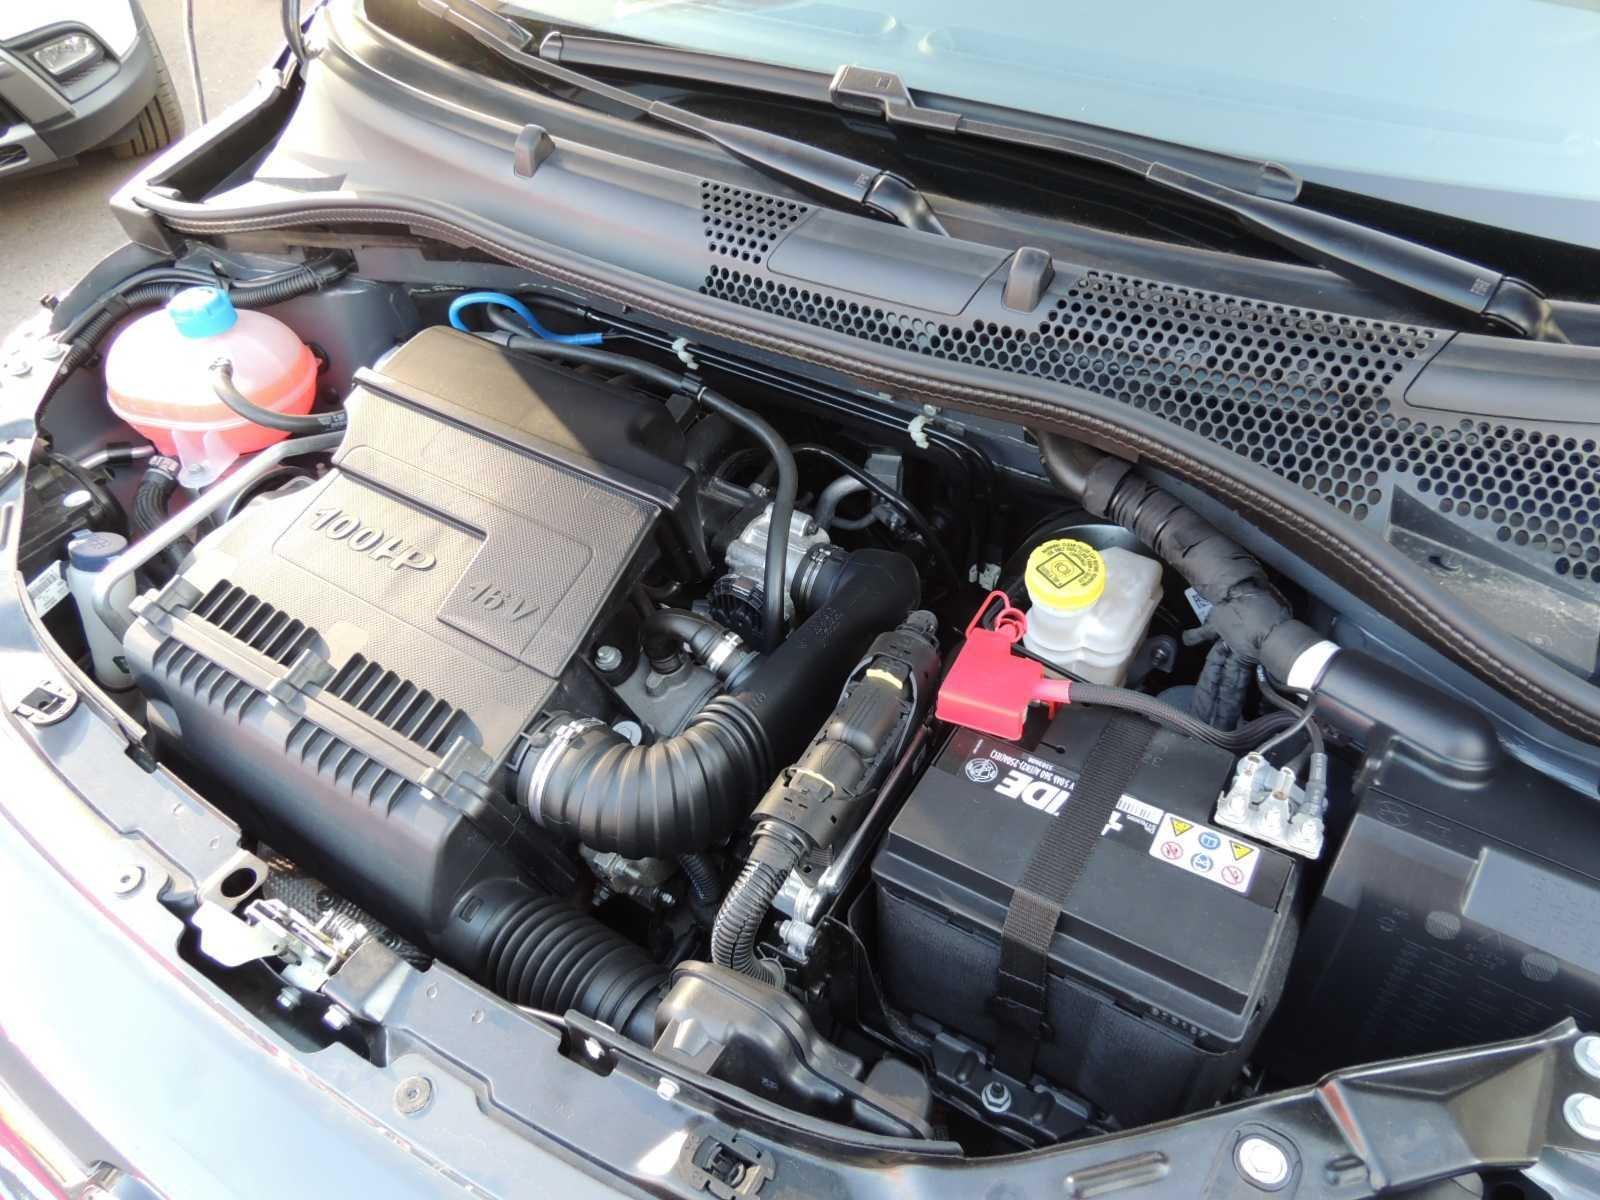 FIAT 500 facelift agosto 2016 (9)